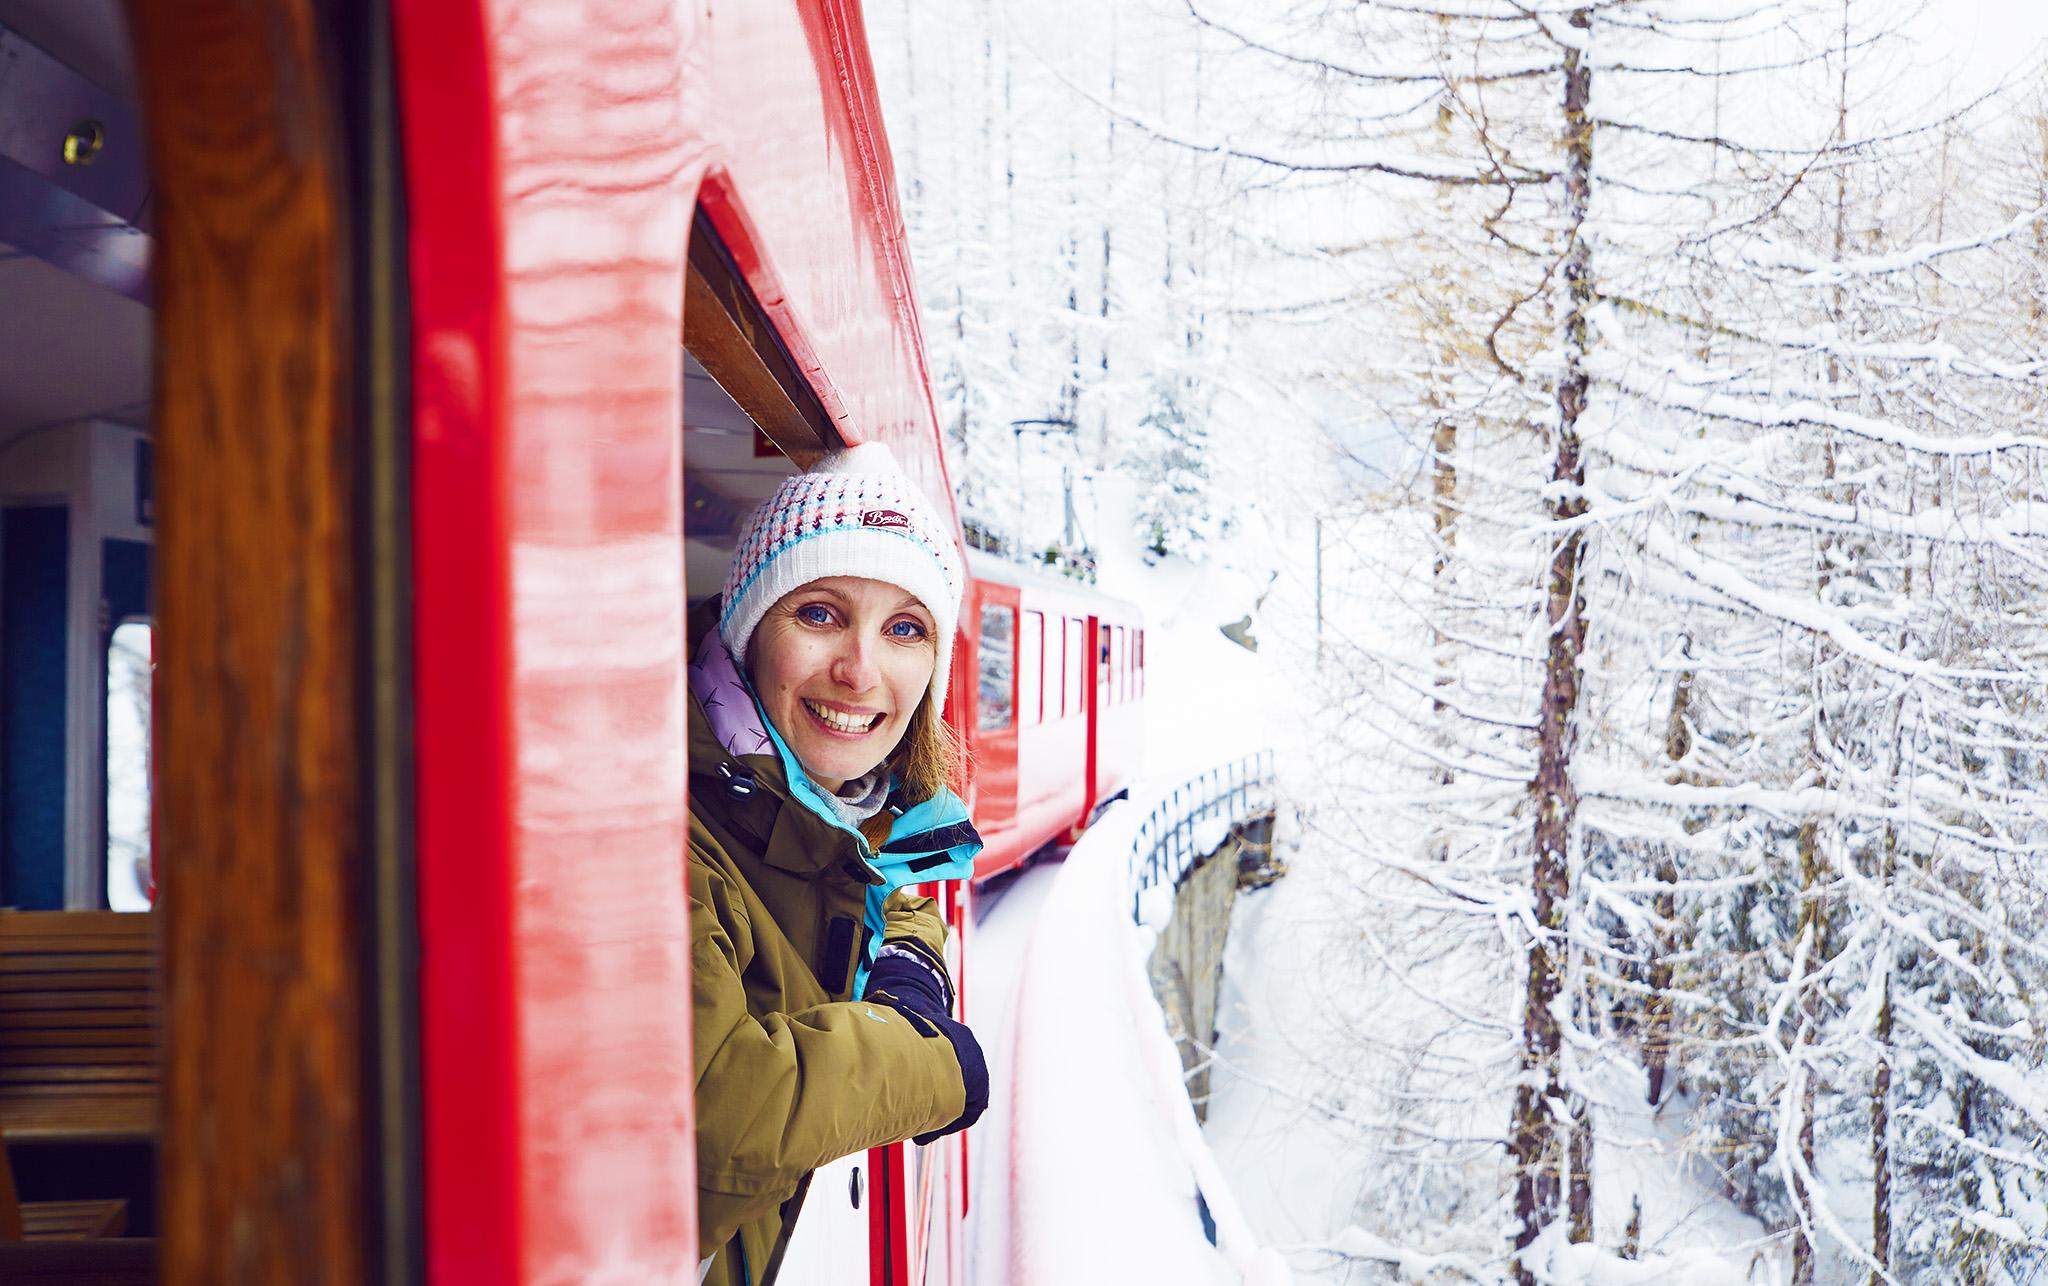 kt_2020_100_keytours_excursions_swisstours_chamonix_mont-blanc_mer_de_glace4_2048_10